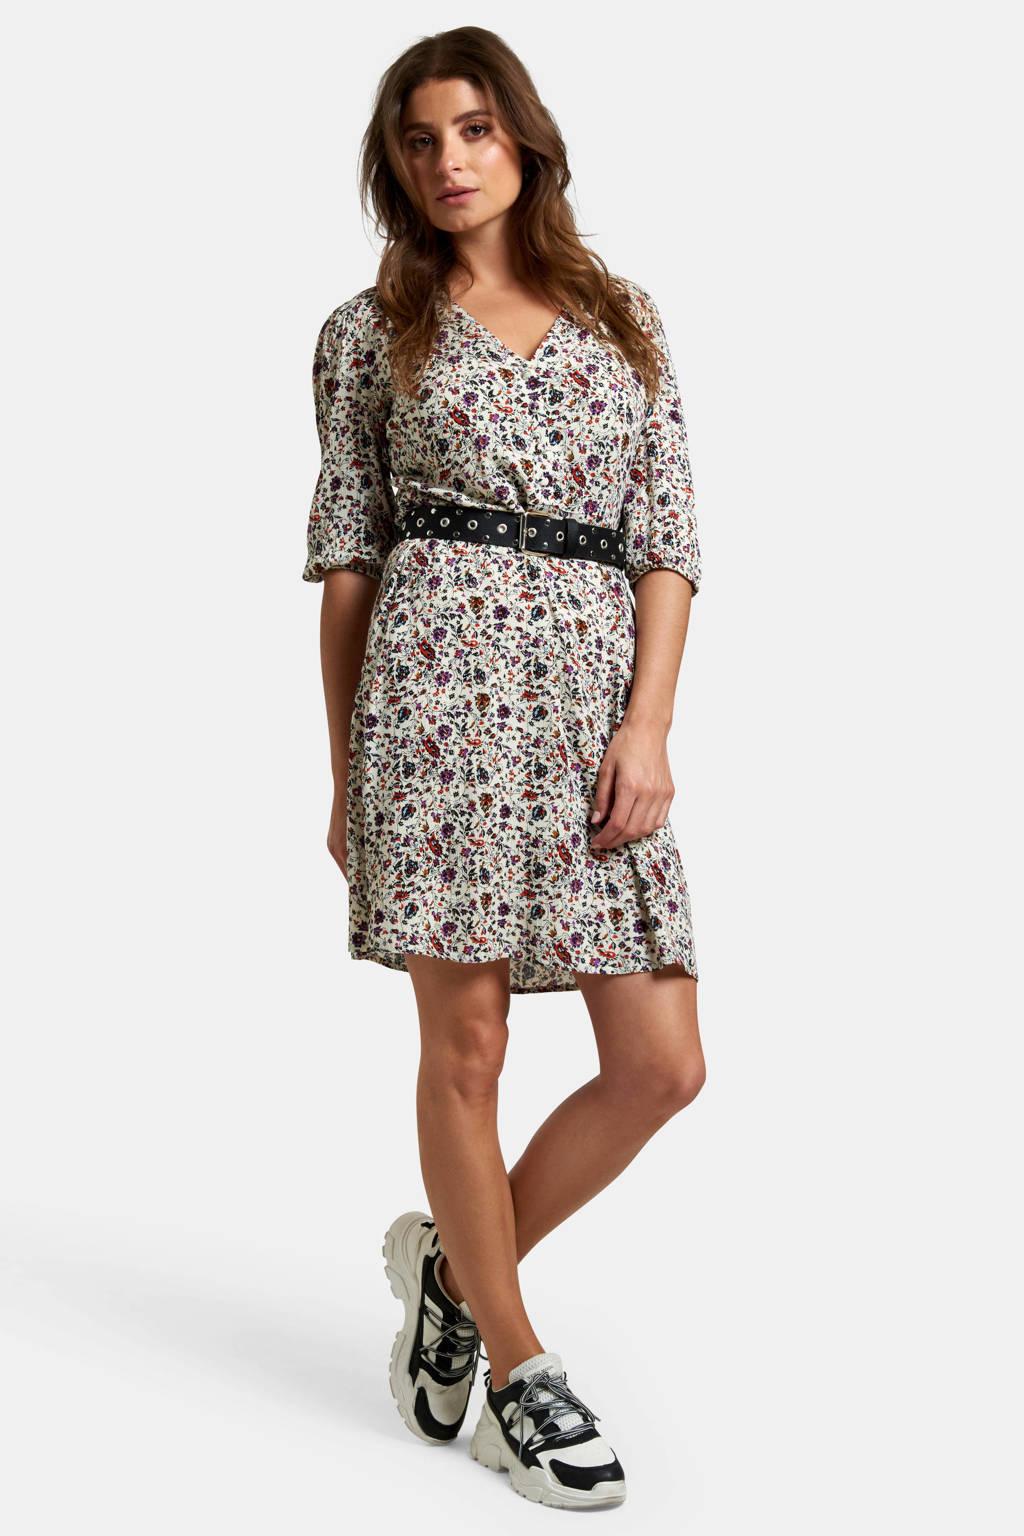 Eksept by Shoeby jurk Julia met all over print wit/rood/paars, Wit/rood/paars